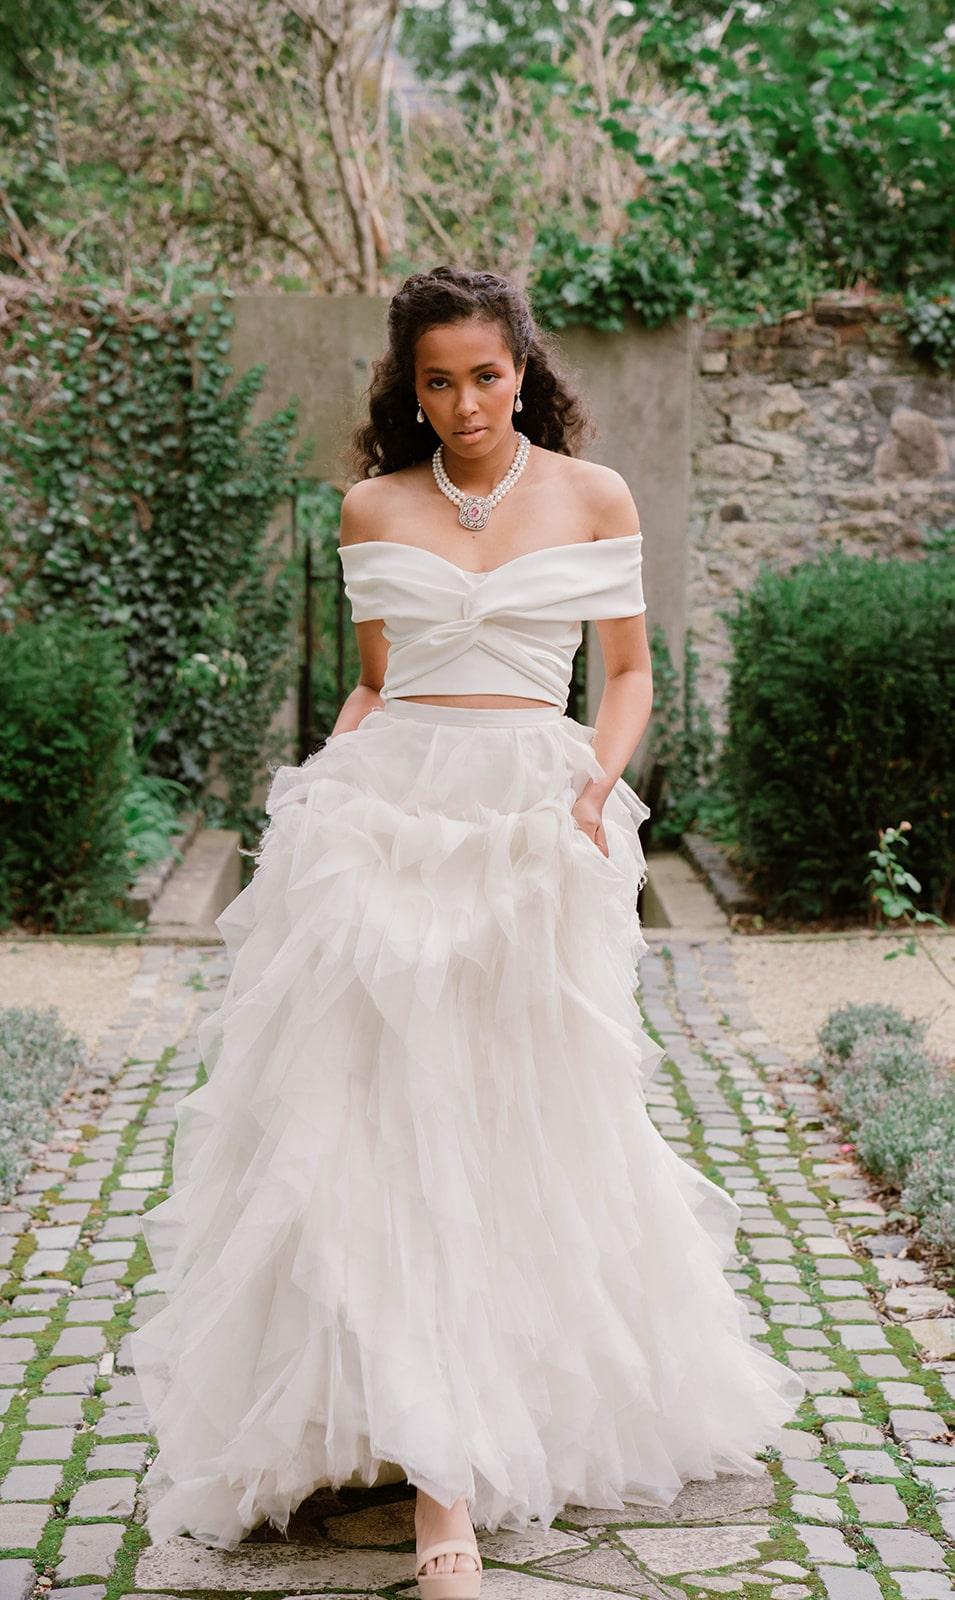 Halfpenny London ruffled bridal skirt and crop top